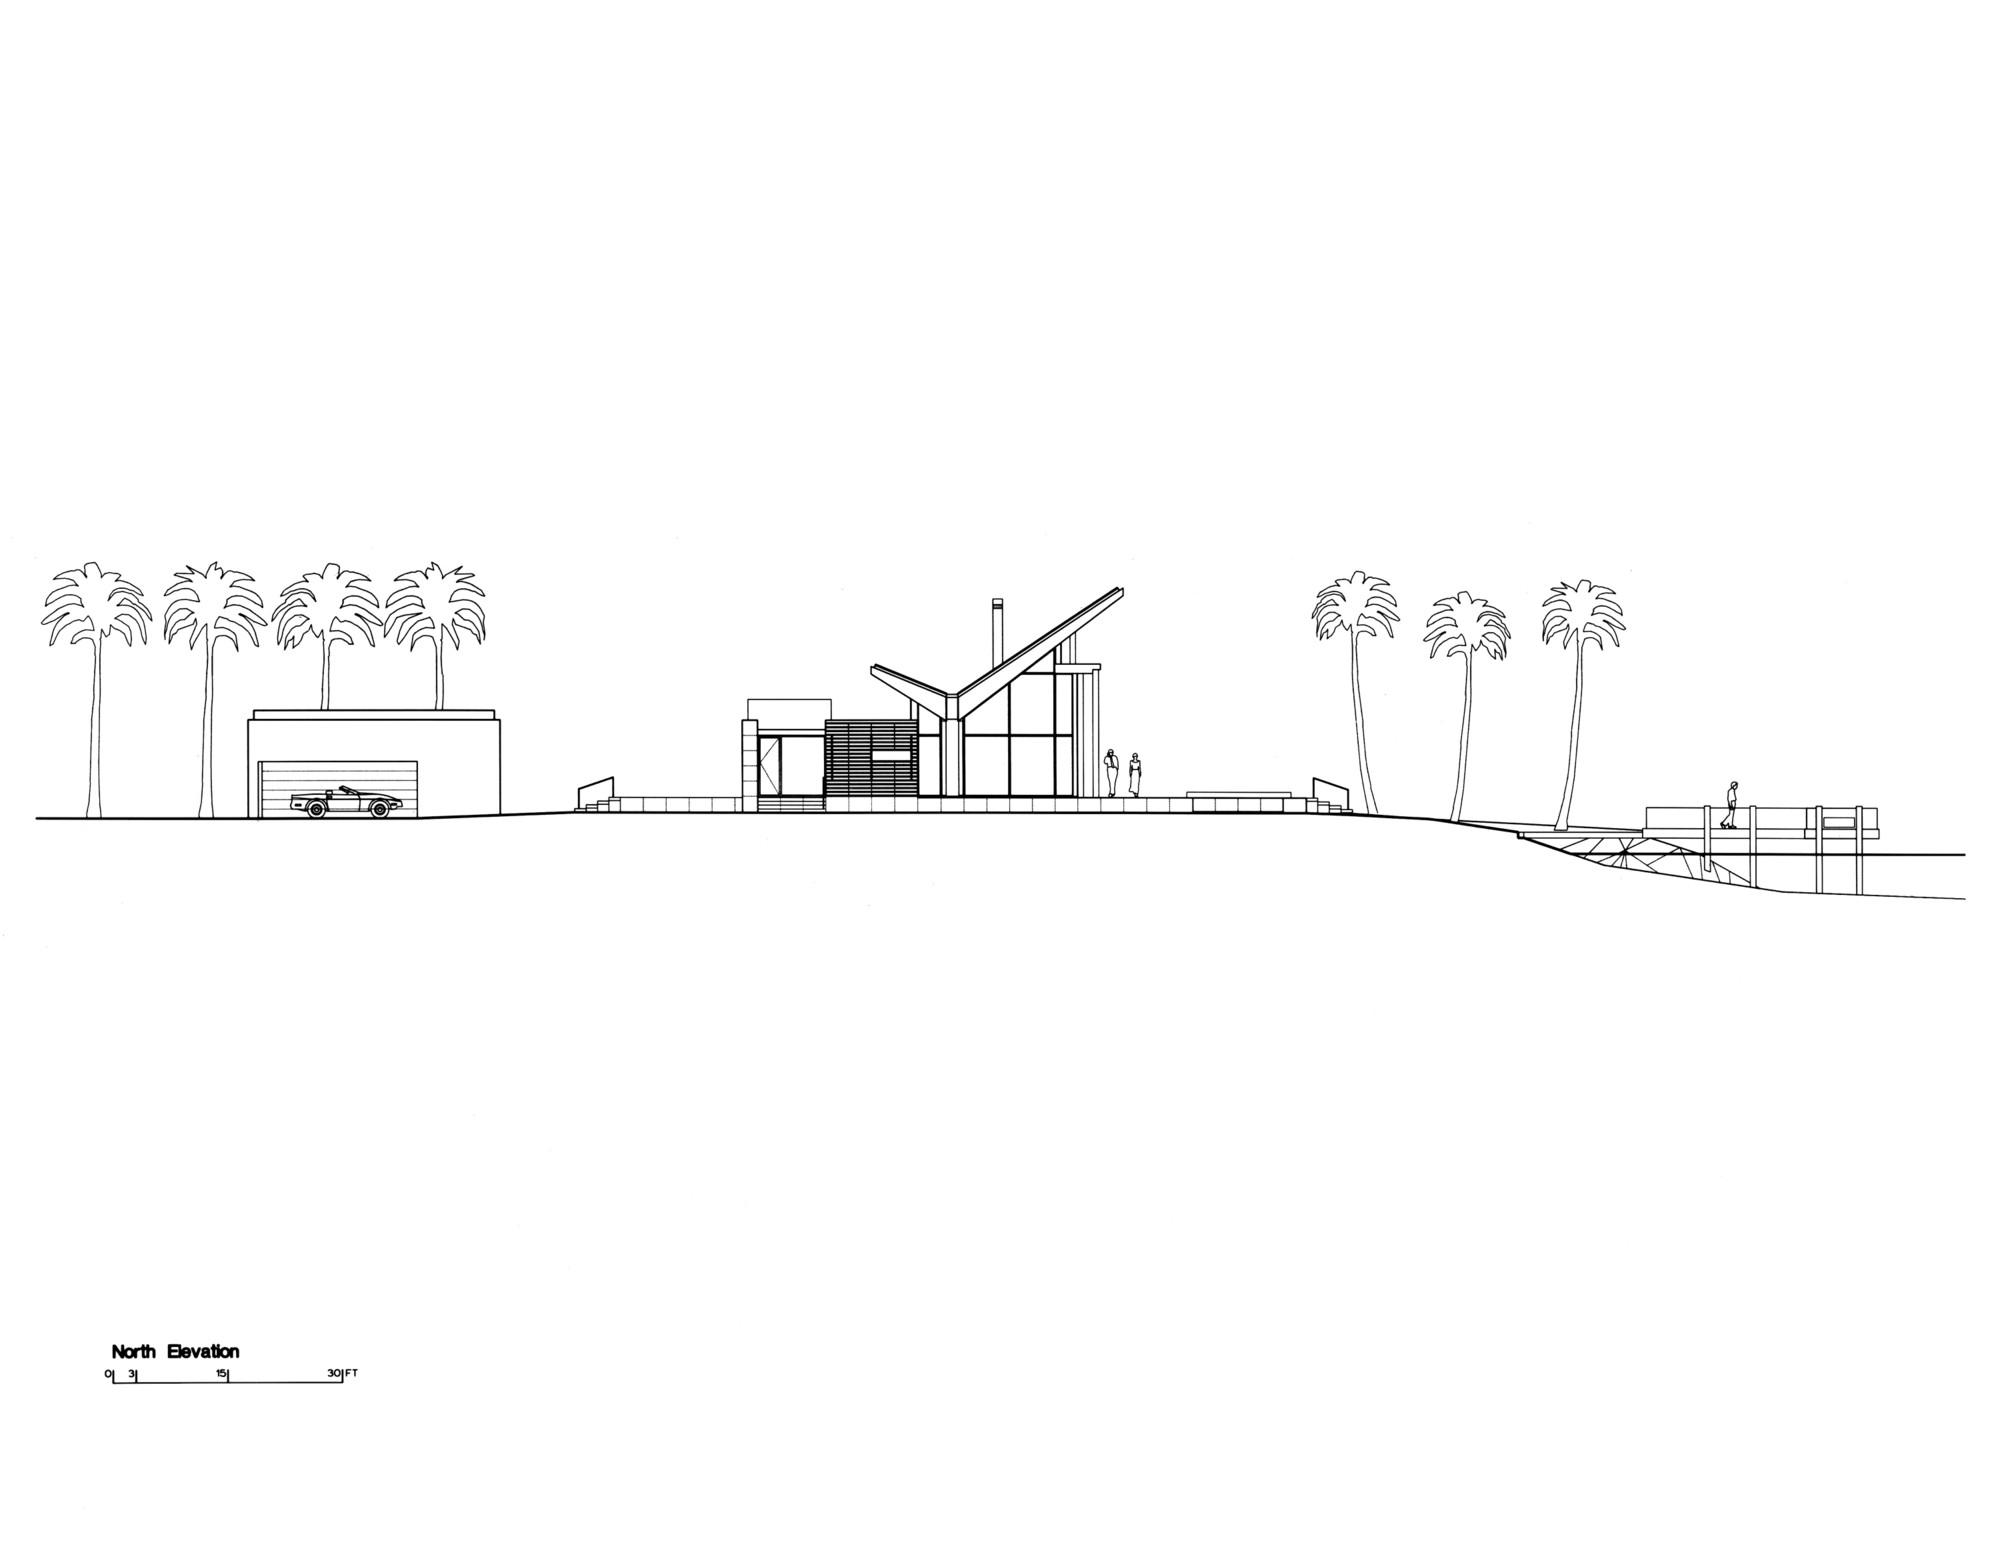 Classics neugebauer house richard meier amp partners architects 8